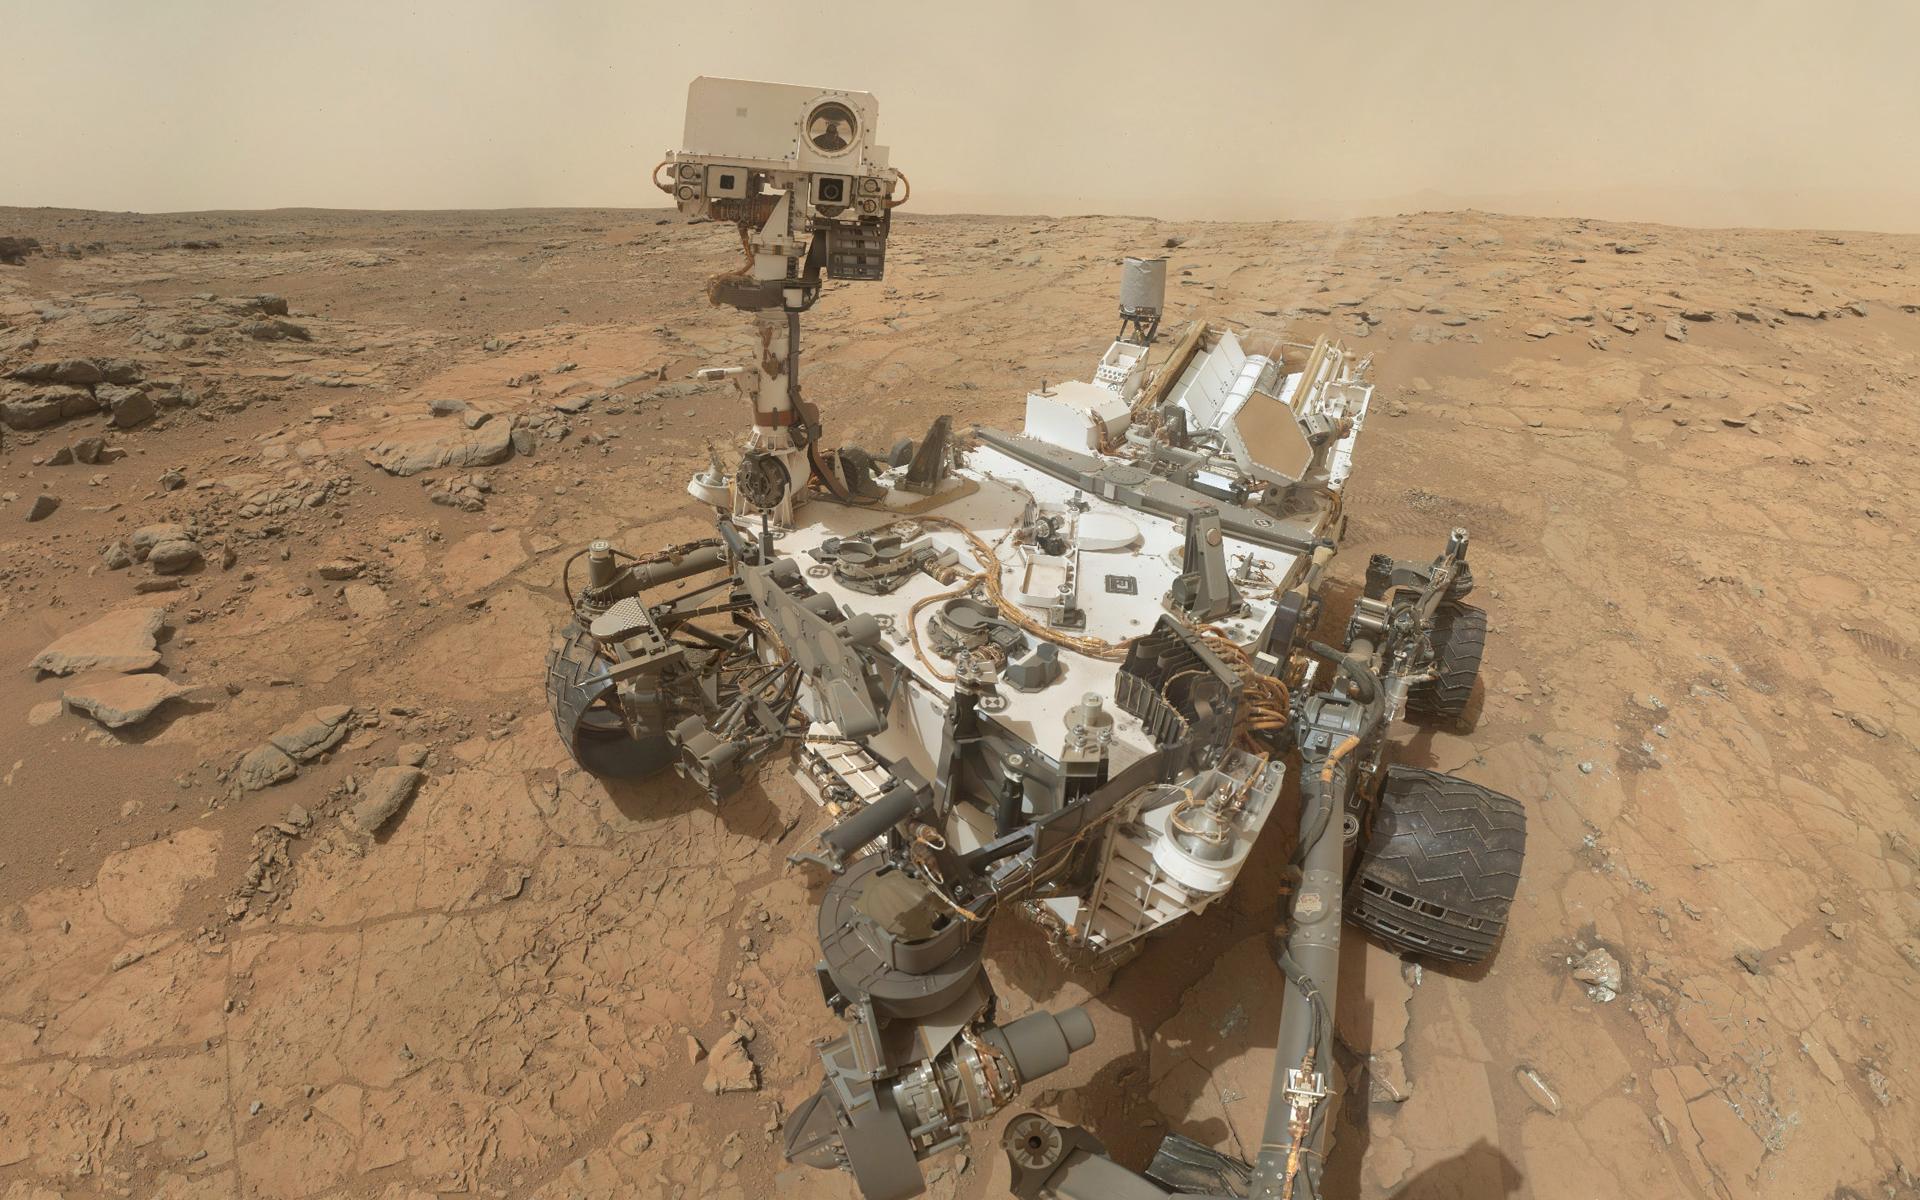 curiosity mars mission - HD1920×1200